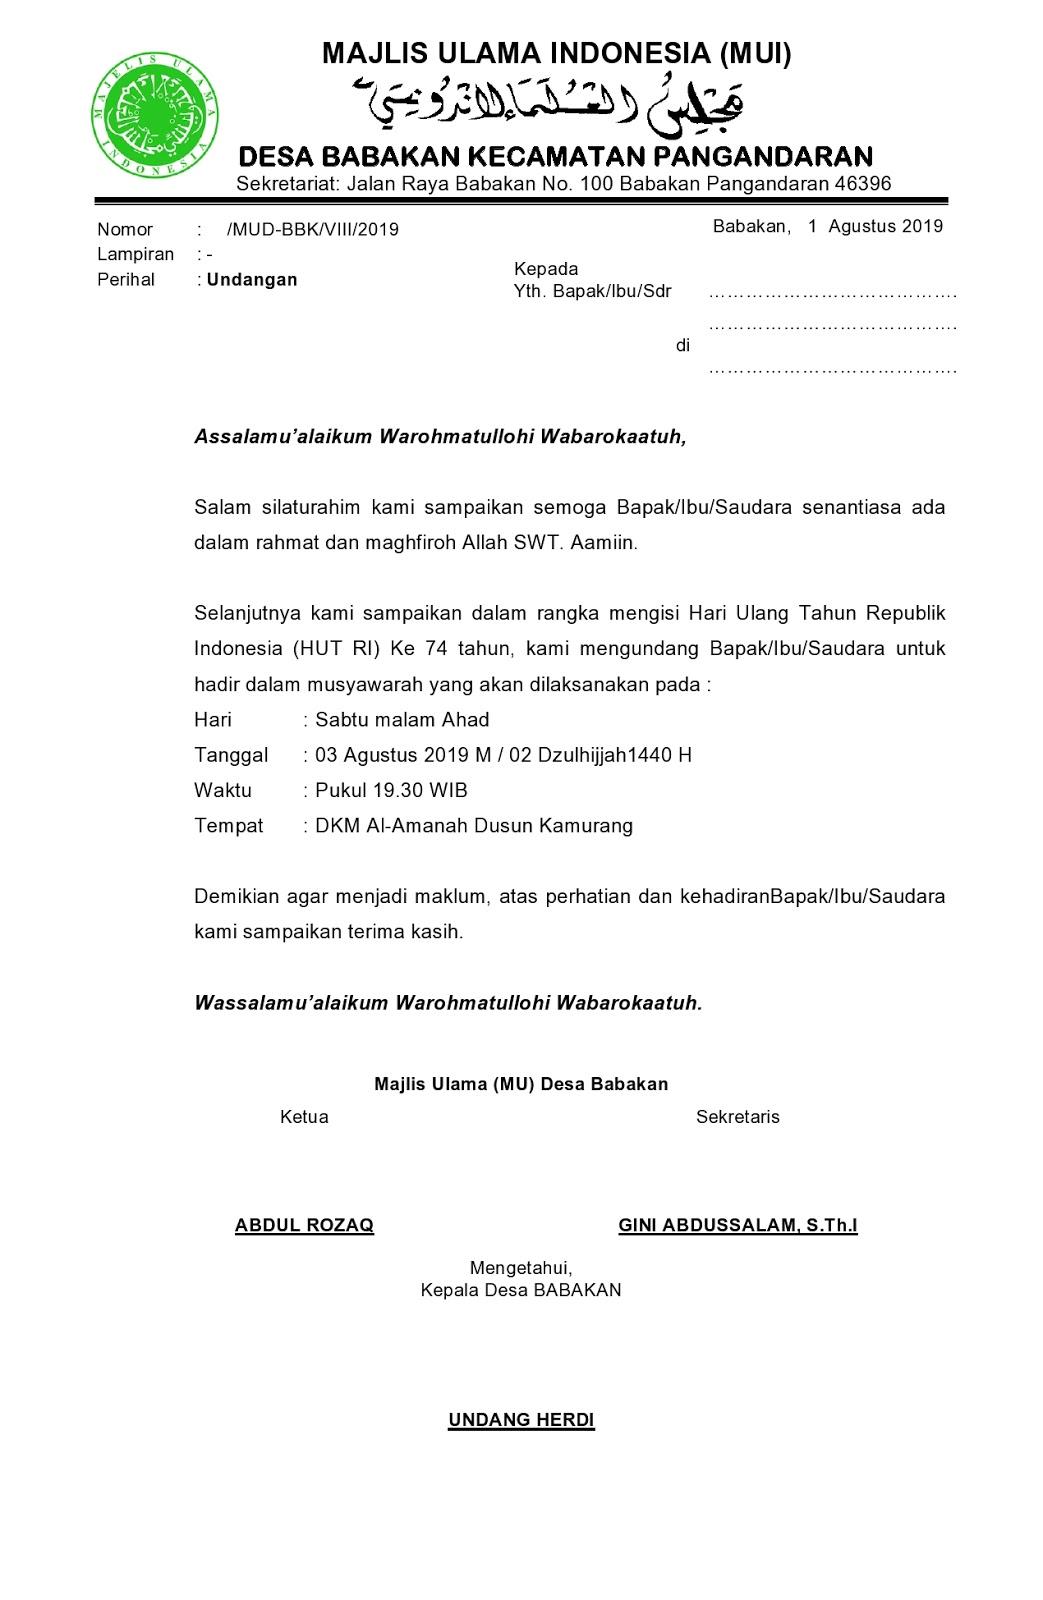 Contoh Surat Undangan Majelis Ulama Indonesia Mui Desa